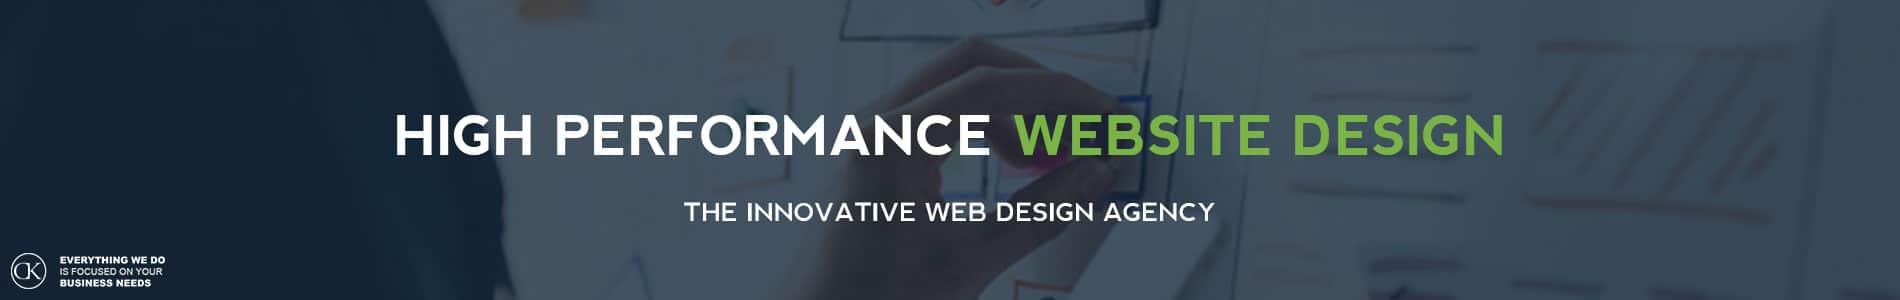 high performance website design by CK web design dublin - featured image